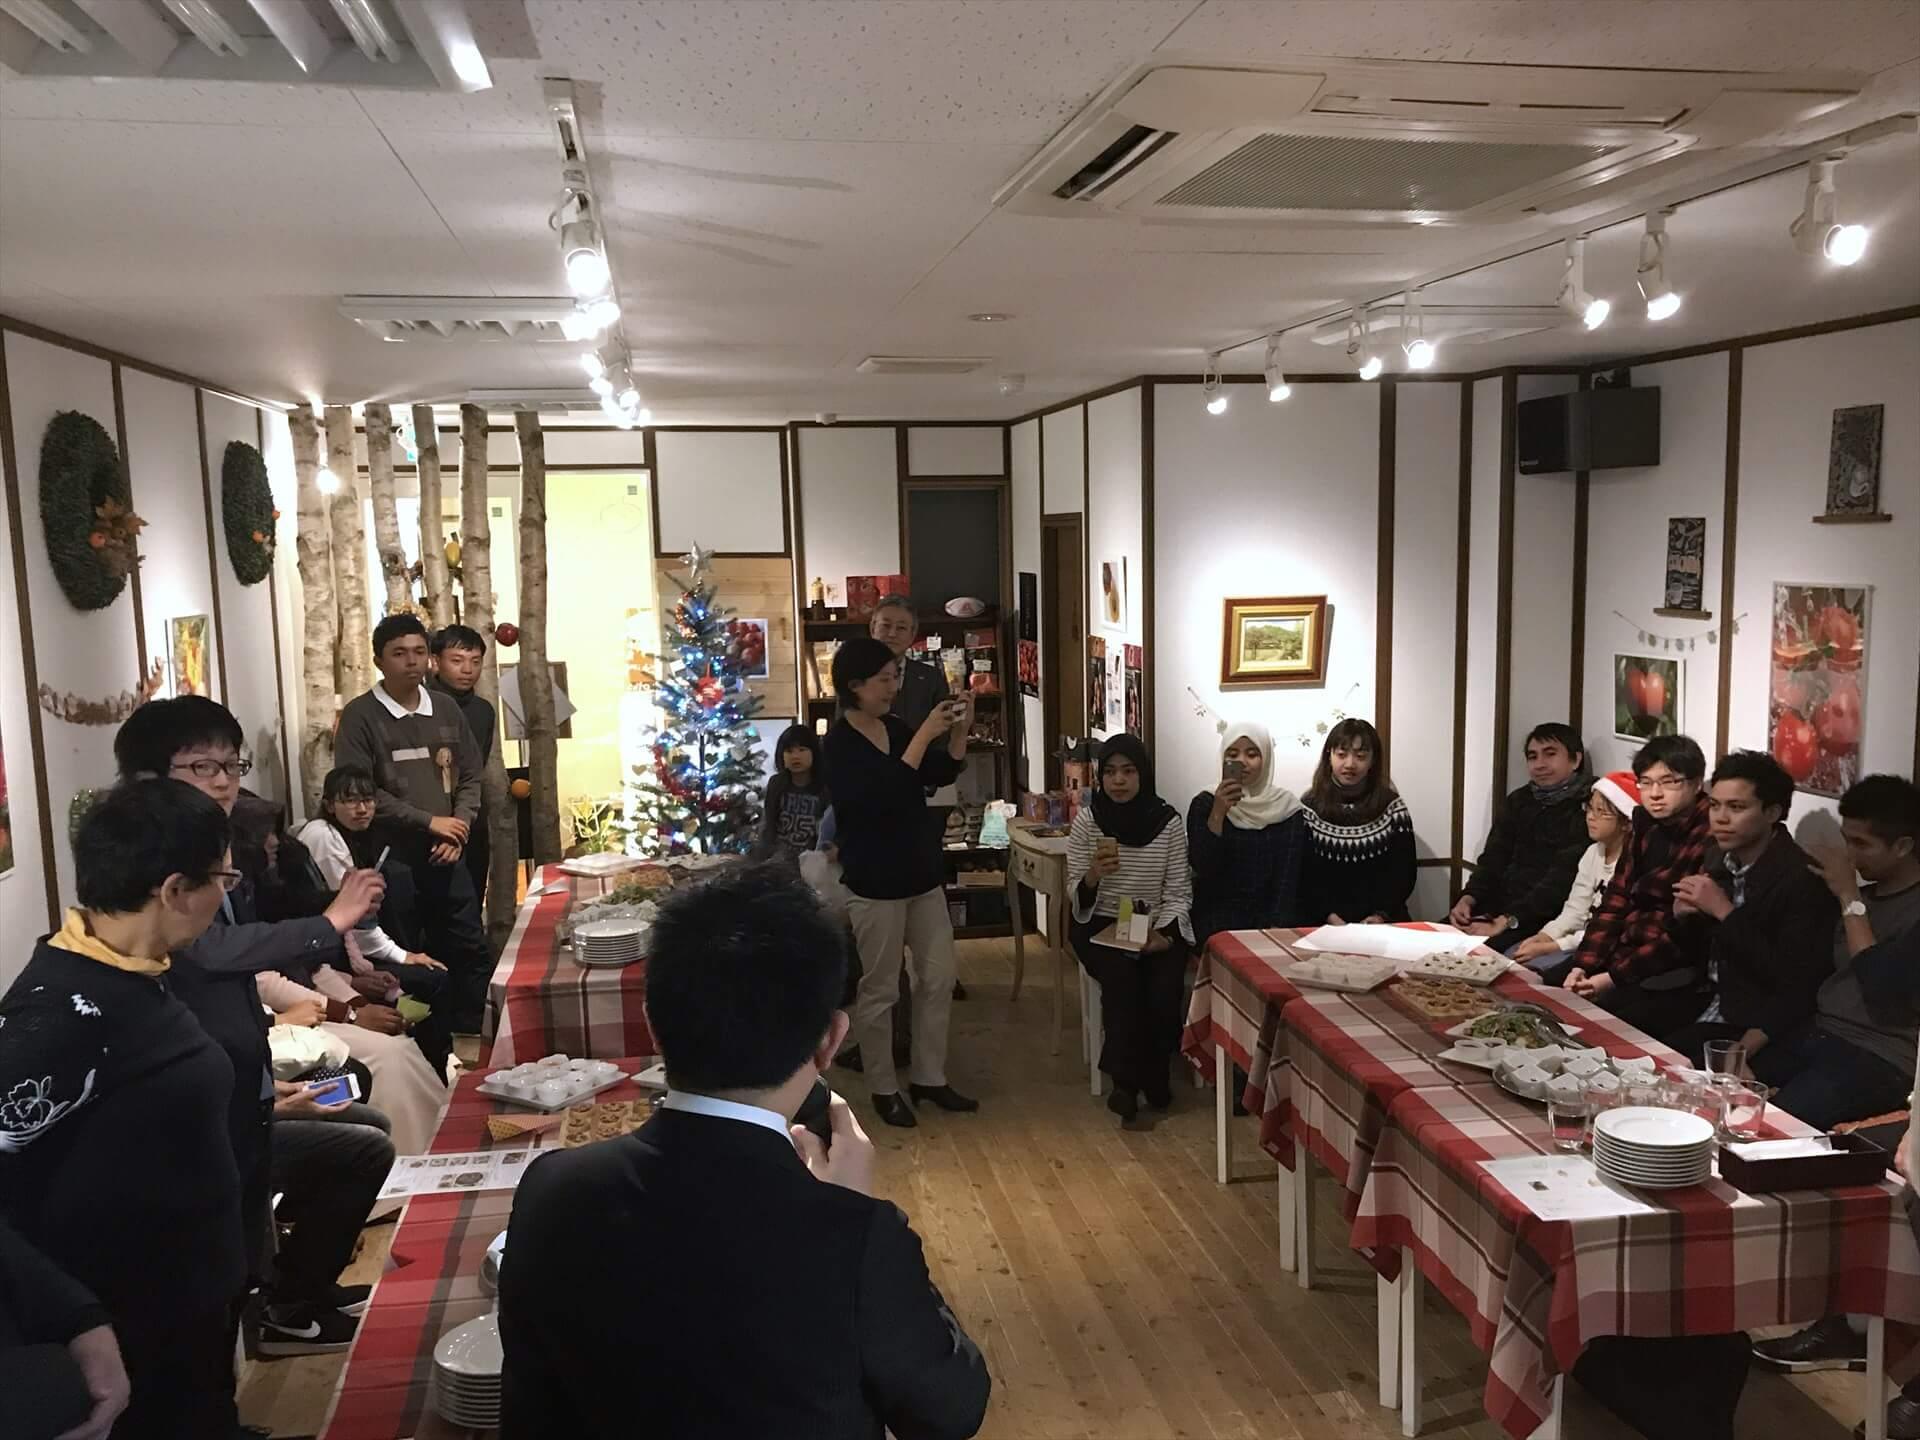 3te' Cafe' サンテカフェ ムスリムフレンドリー 心斎橋 大阪 CONVI